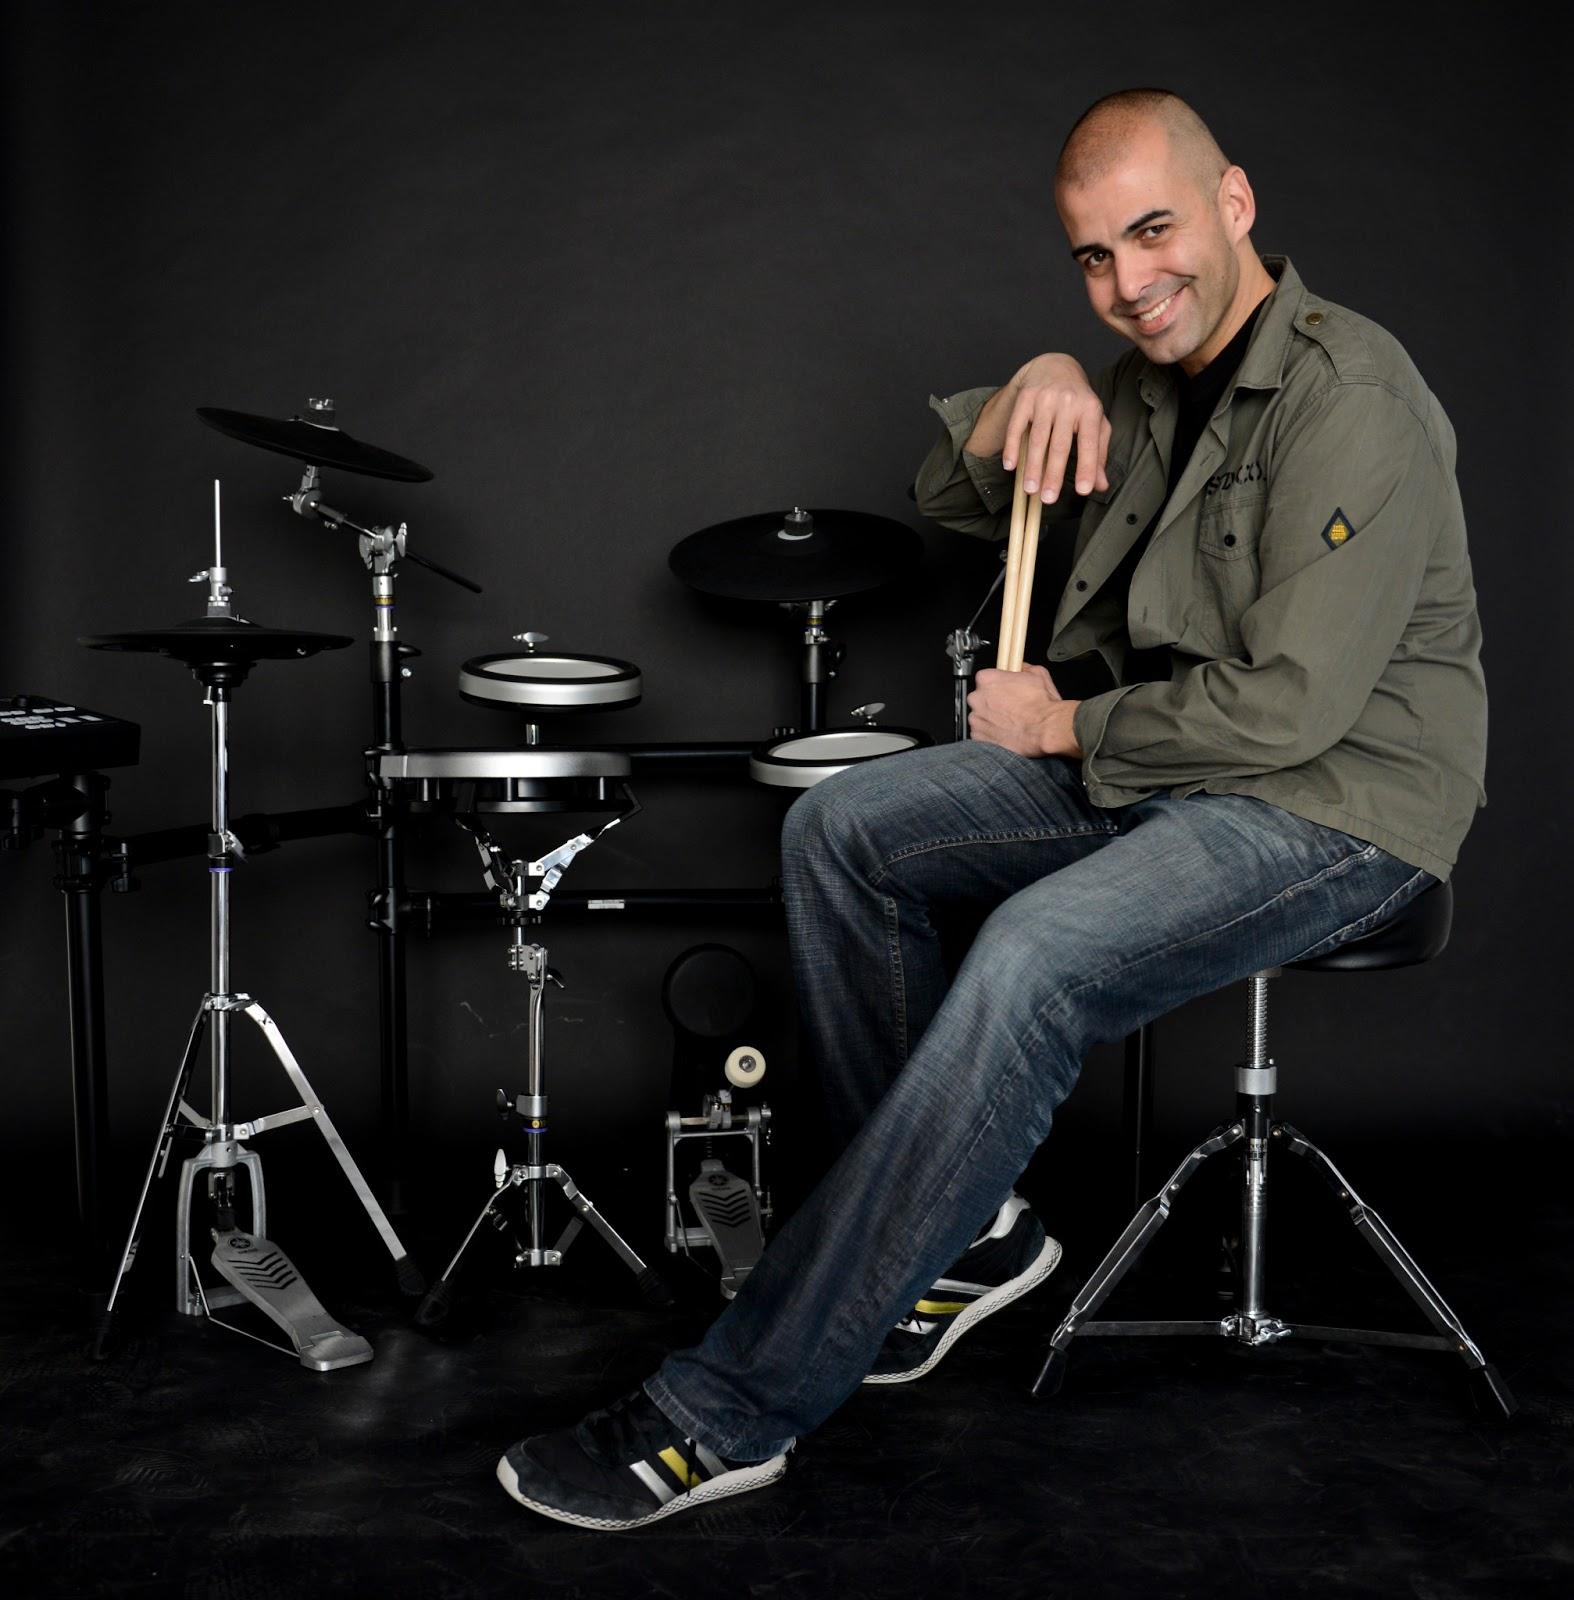 Yamaha Dtxk Electronic Drum Kit With Headphones Stool Sticks